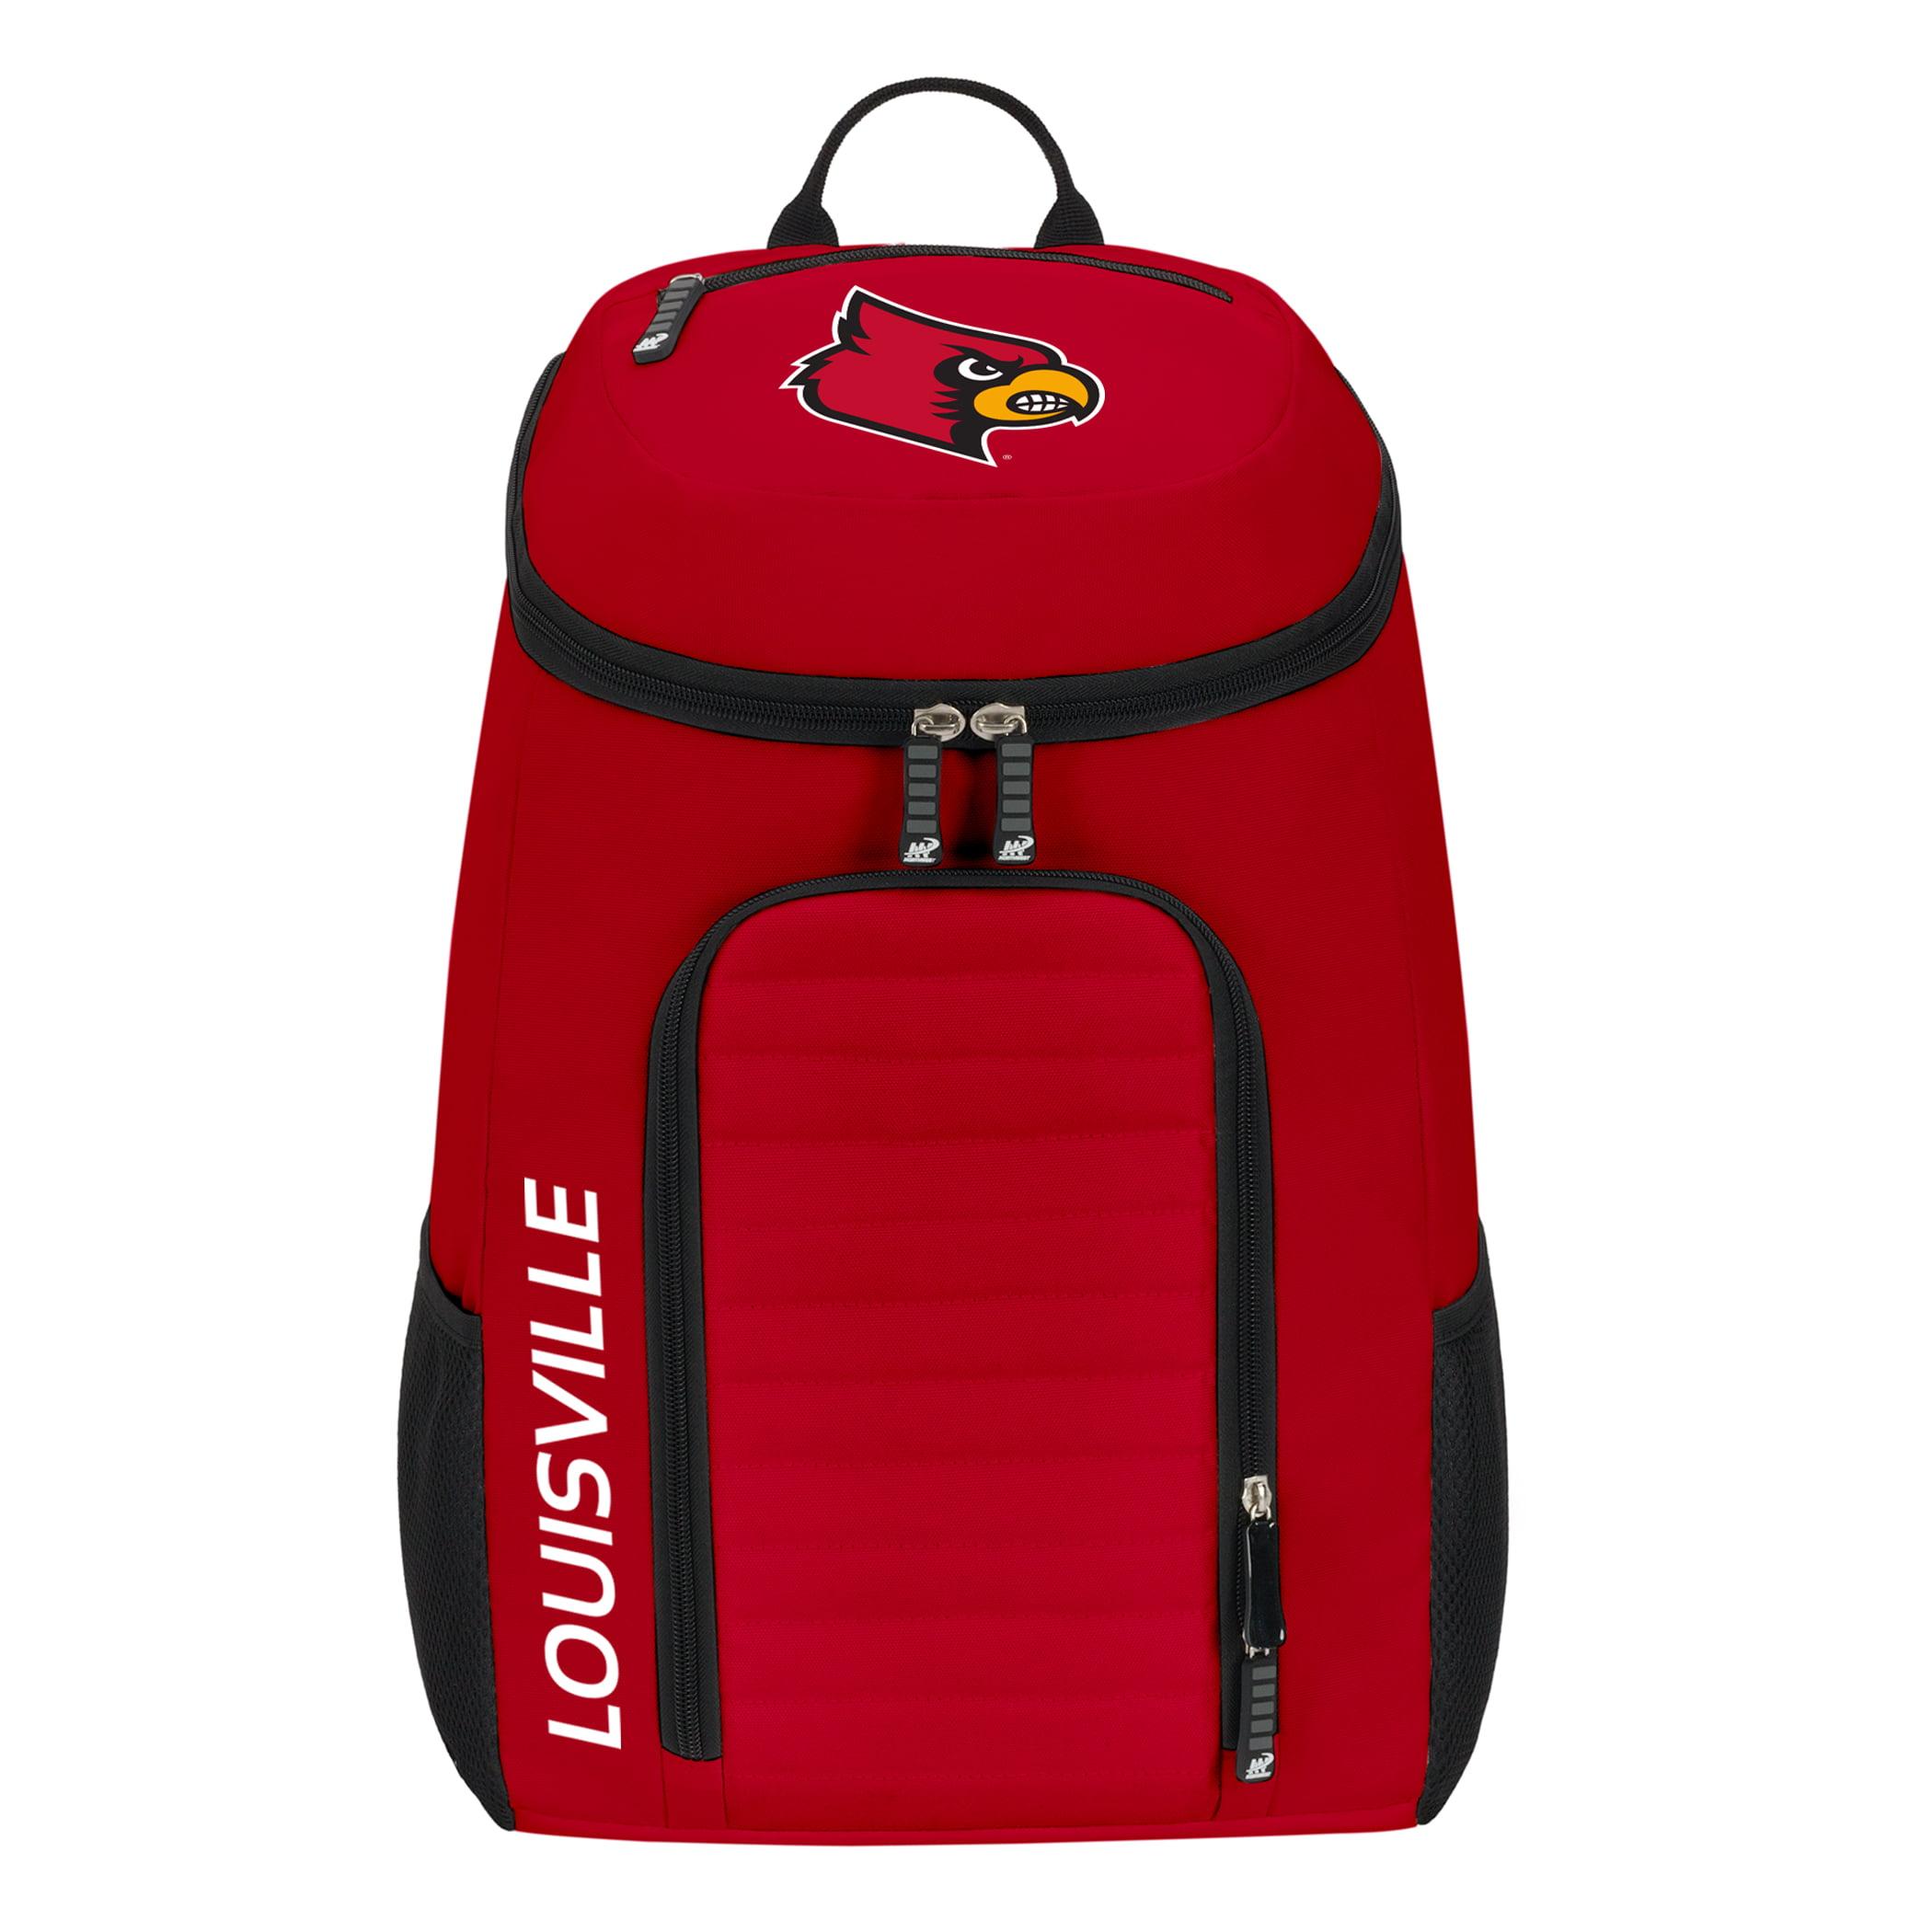 The Northwest Company NCAA unisex-adult Topliner Backpack